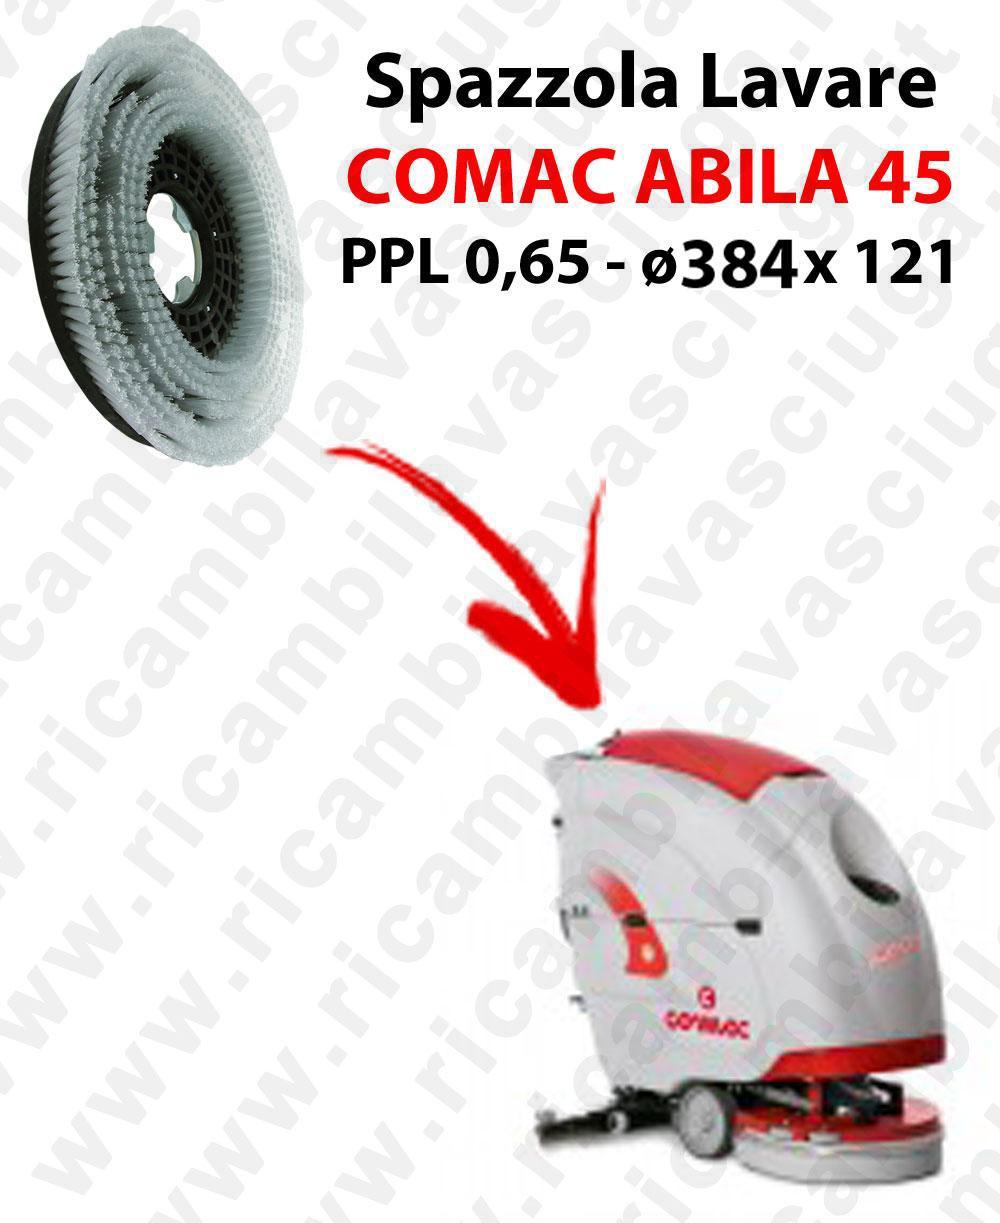 SPAZZOLA LAVARE per lavapavimenti COMAC ABILA 45 PPL 0,65  ø384 X 121